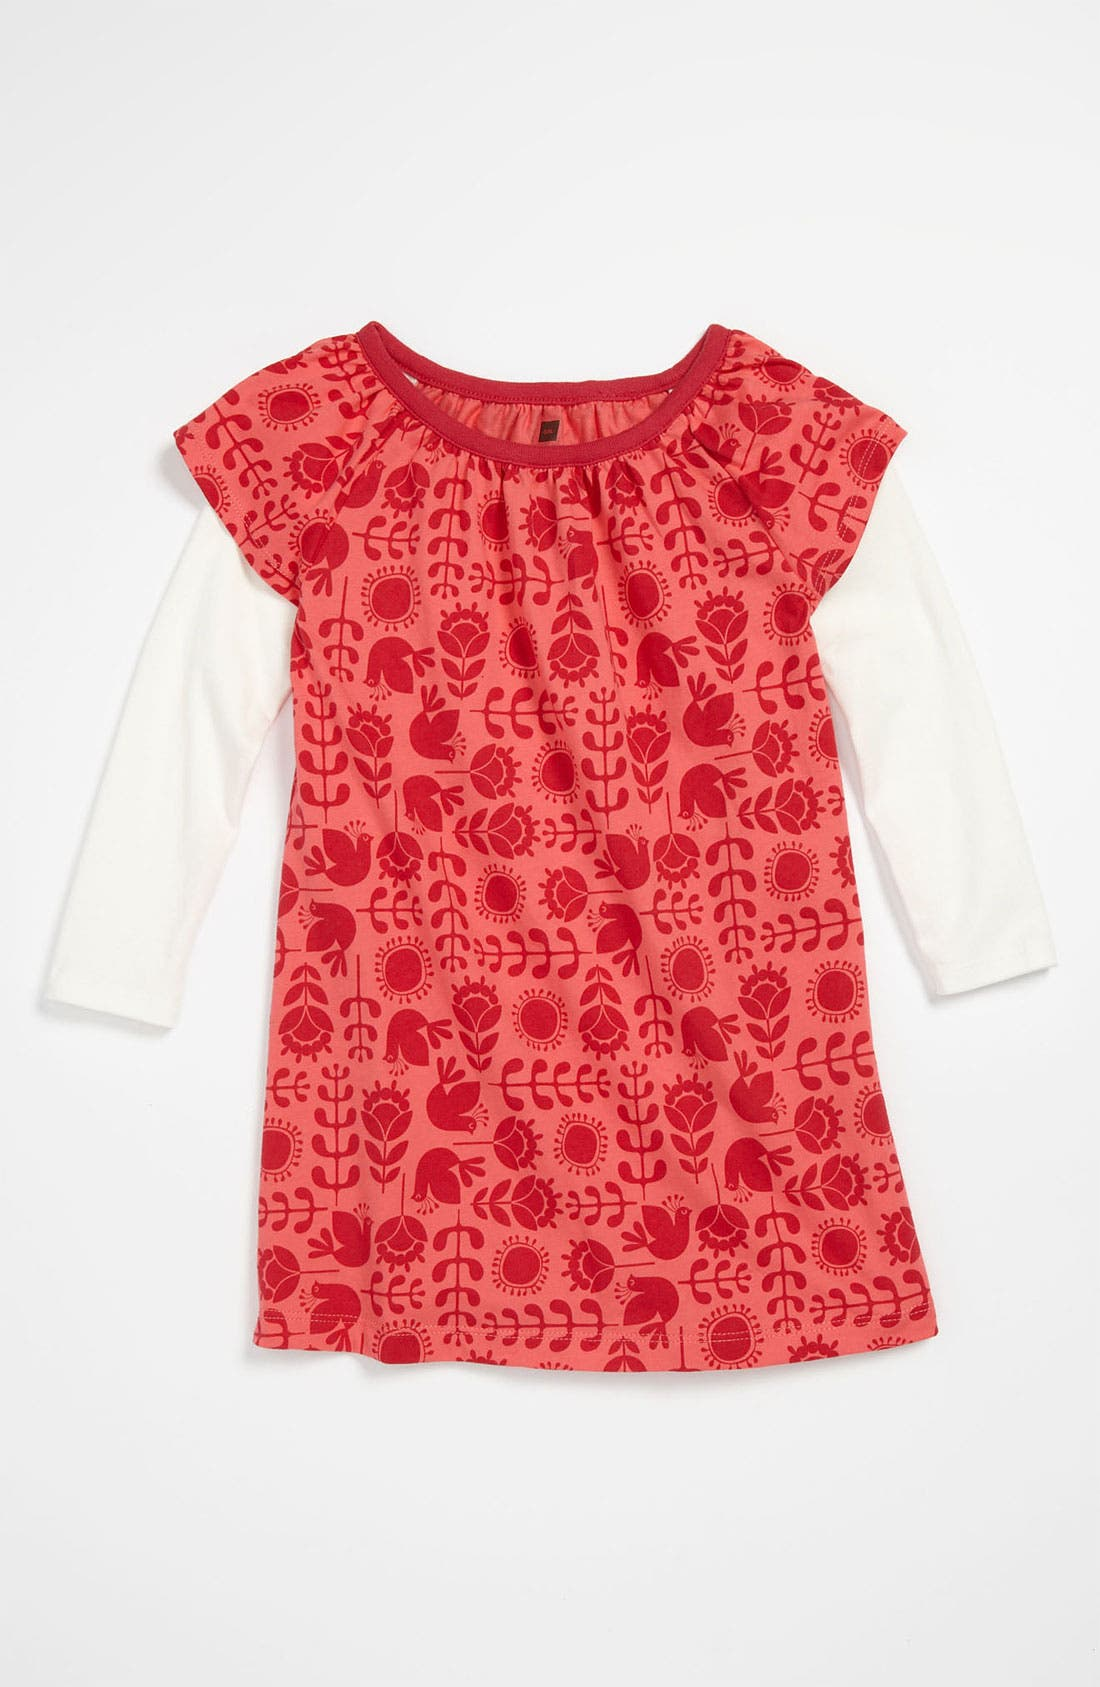 Alternate Image 1 Selected - Tea Collection 'Swedish Lark' Dress (Toddler)